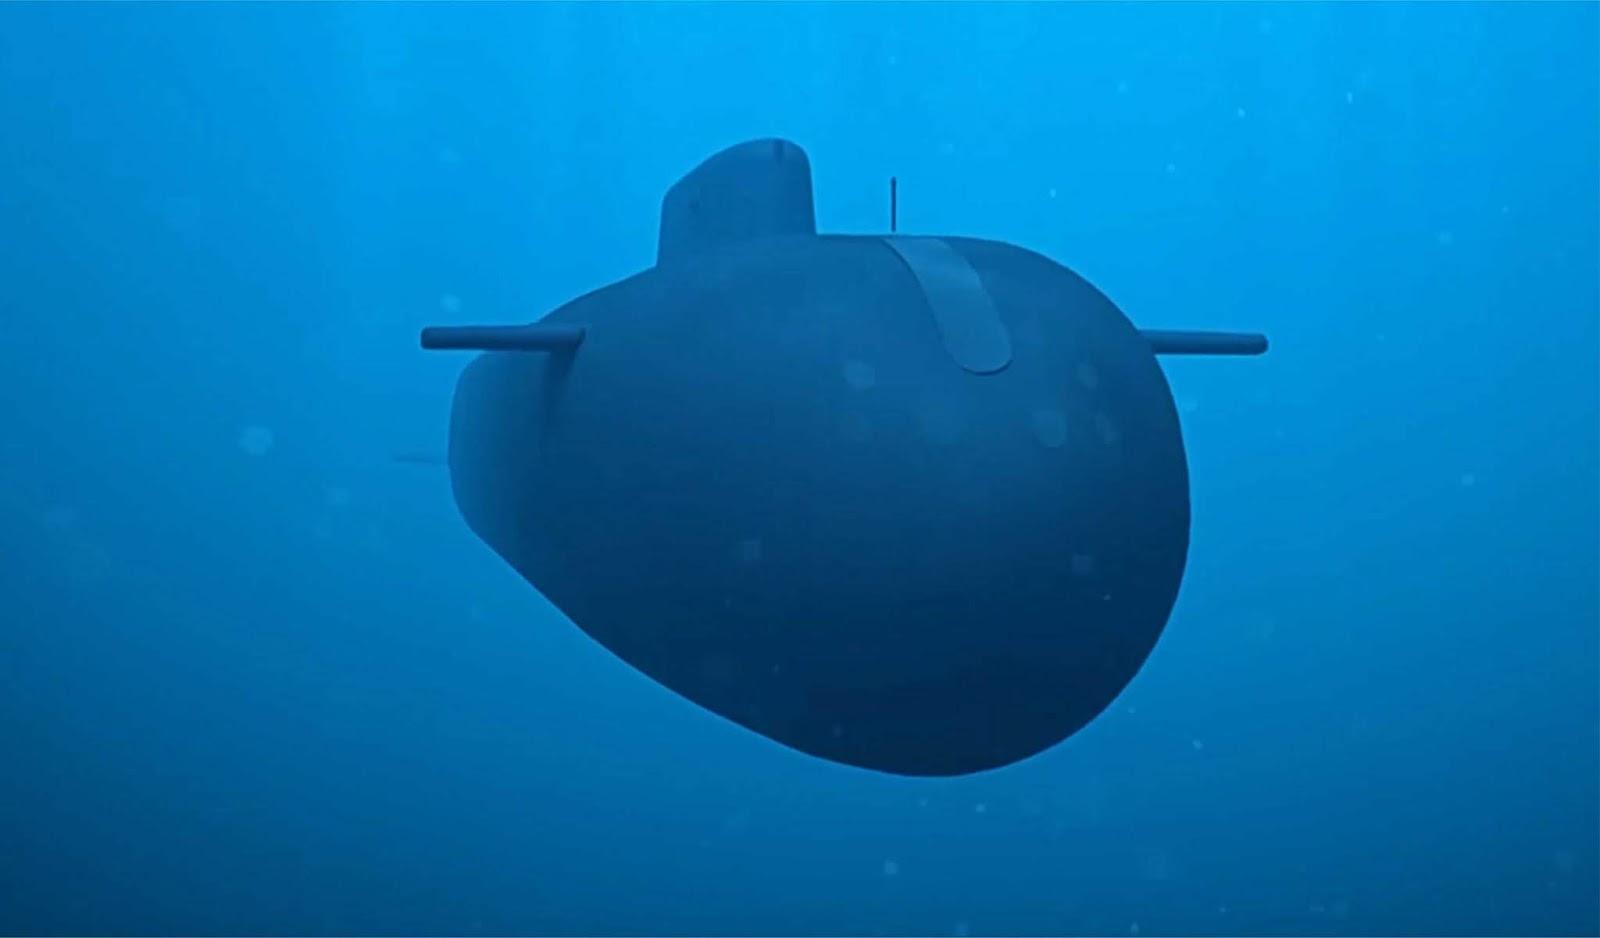 Tes reaktor nuklir Poseidon mengkonfirmasi jangkauan dan kecepatannya